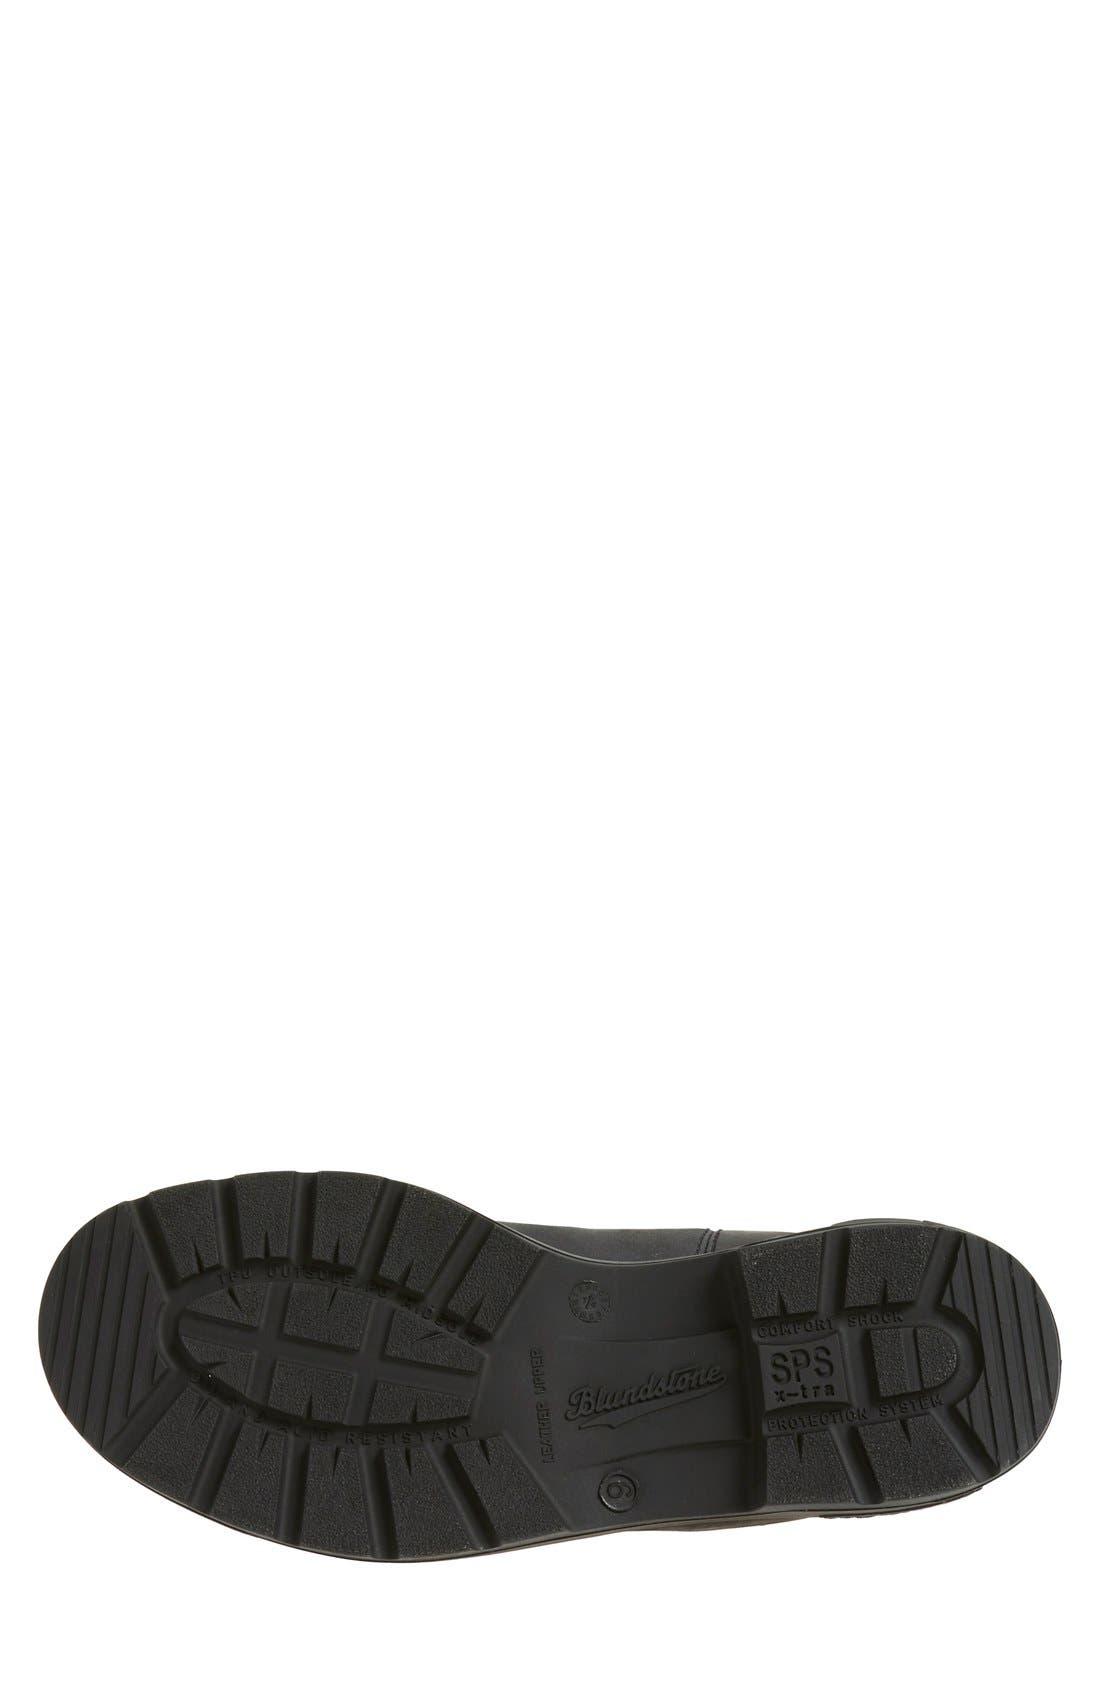 Footwear Chelsea Boot,                             Alternate thumbnail 4, color,                             RUSTIC BLACK